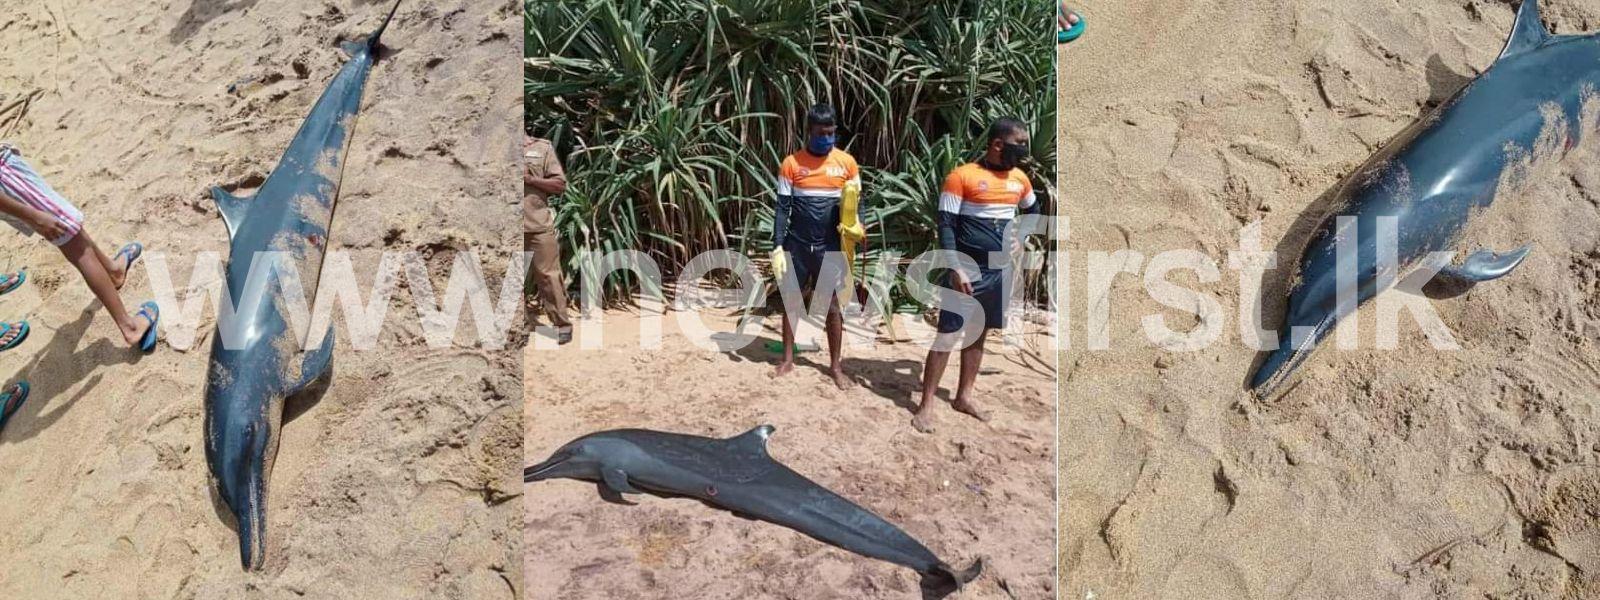 03 dolphins washed ashore in Katukurunda, Kalutara